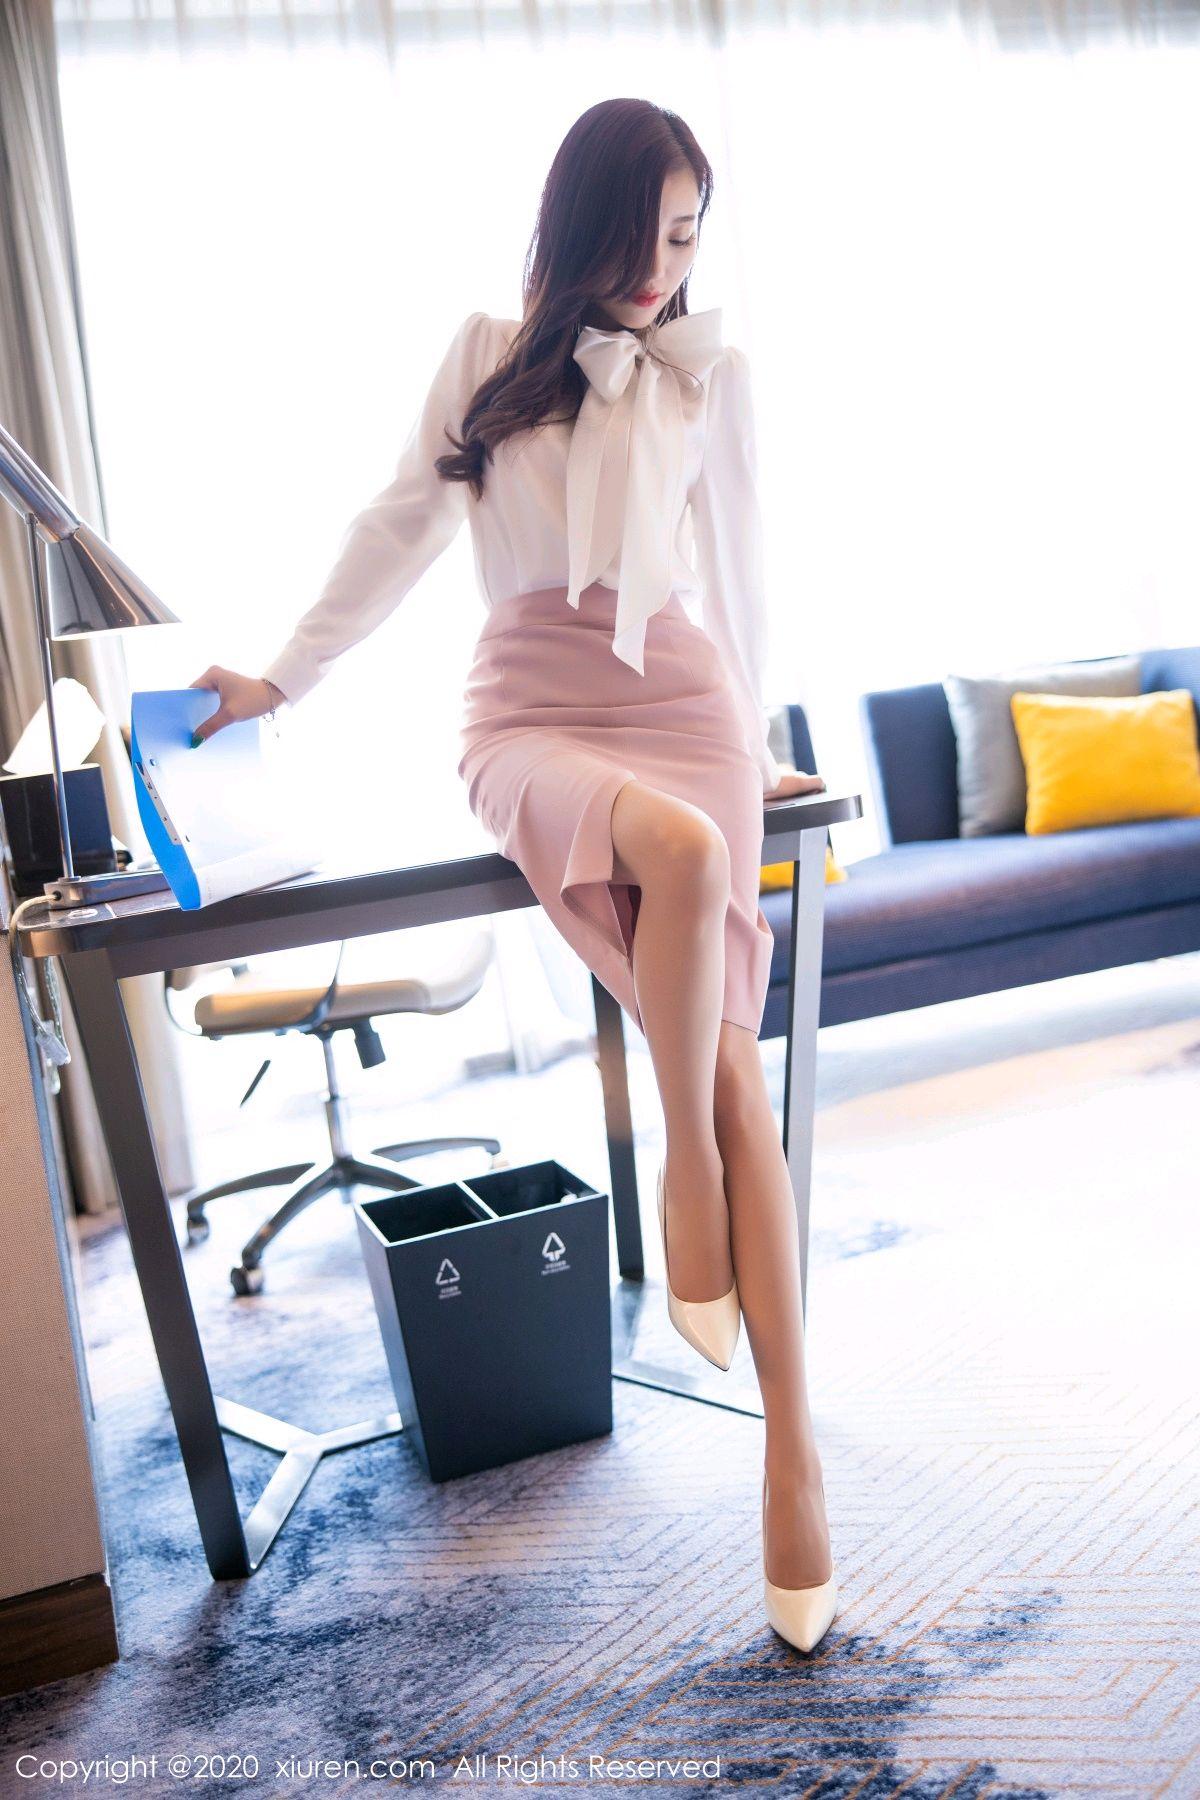 [XiuRen] Vol.2431 Yang Chen Chen 16P, Tall, Underwear, Uniform, Xiuren, Yang Chen Chen